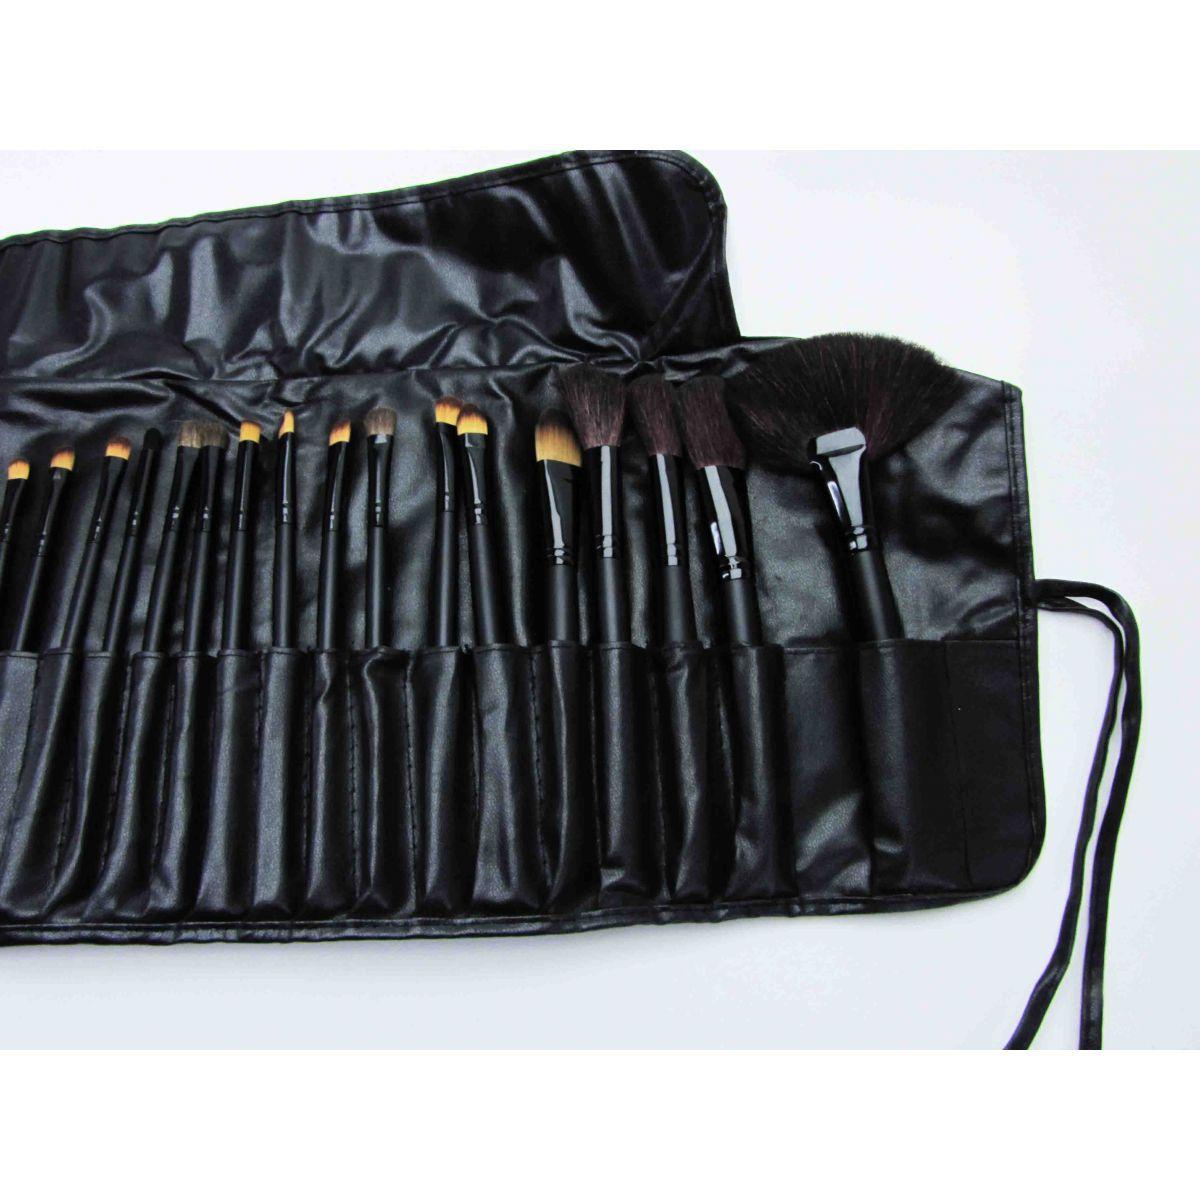 Kit Maleta Preta Maquiagem Grande Profissional + 32 Pincéis